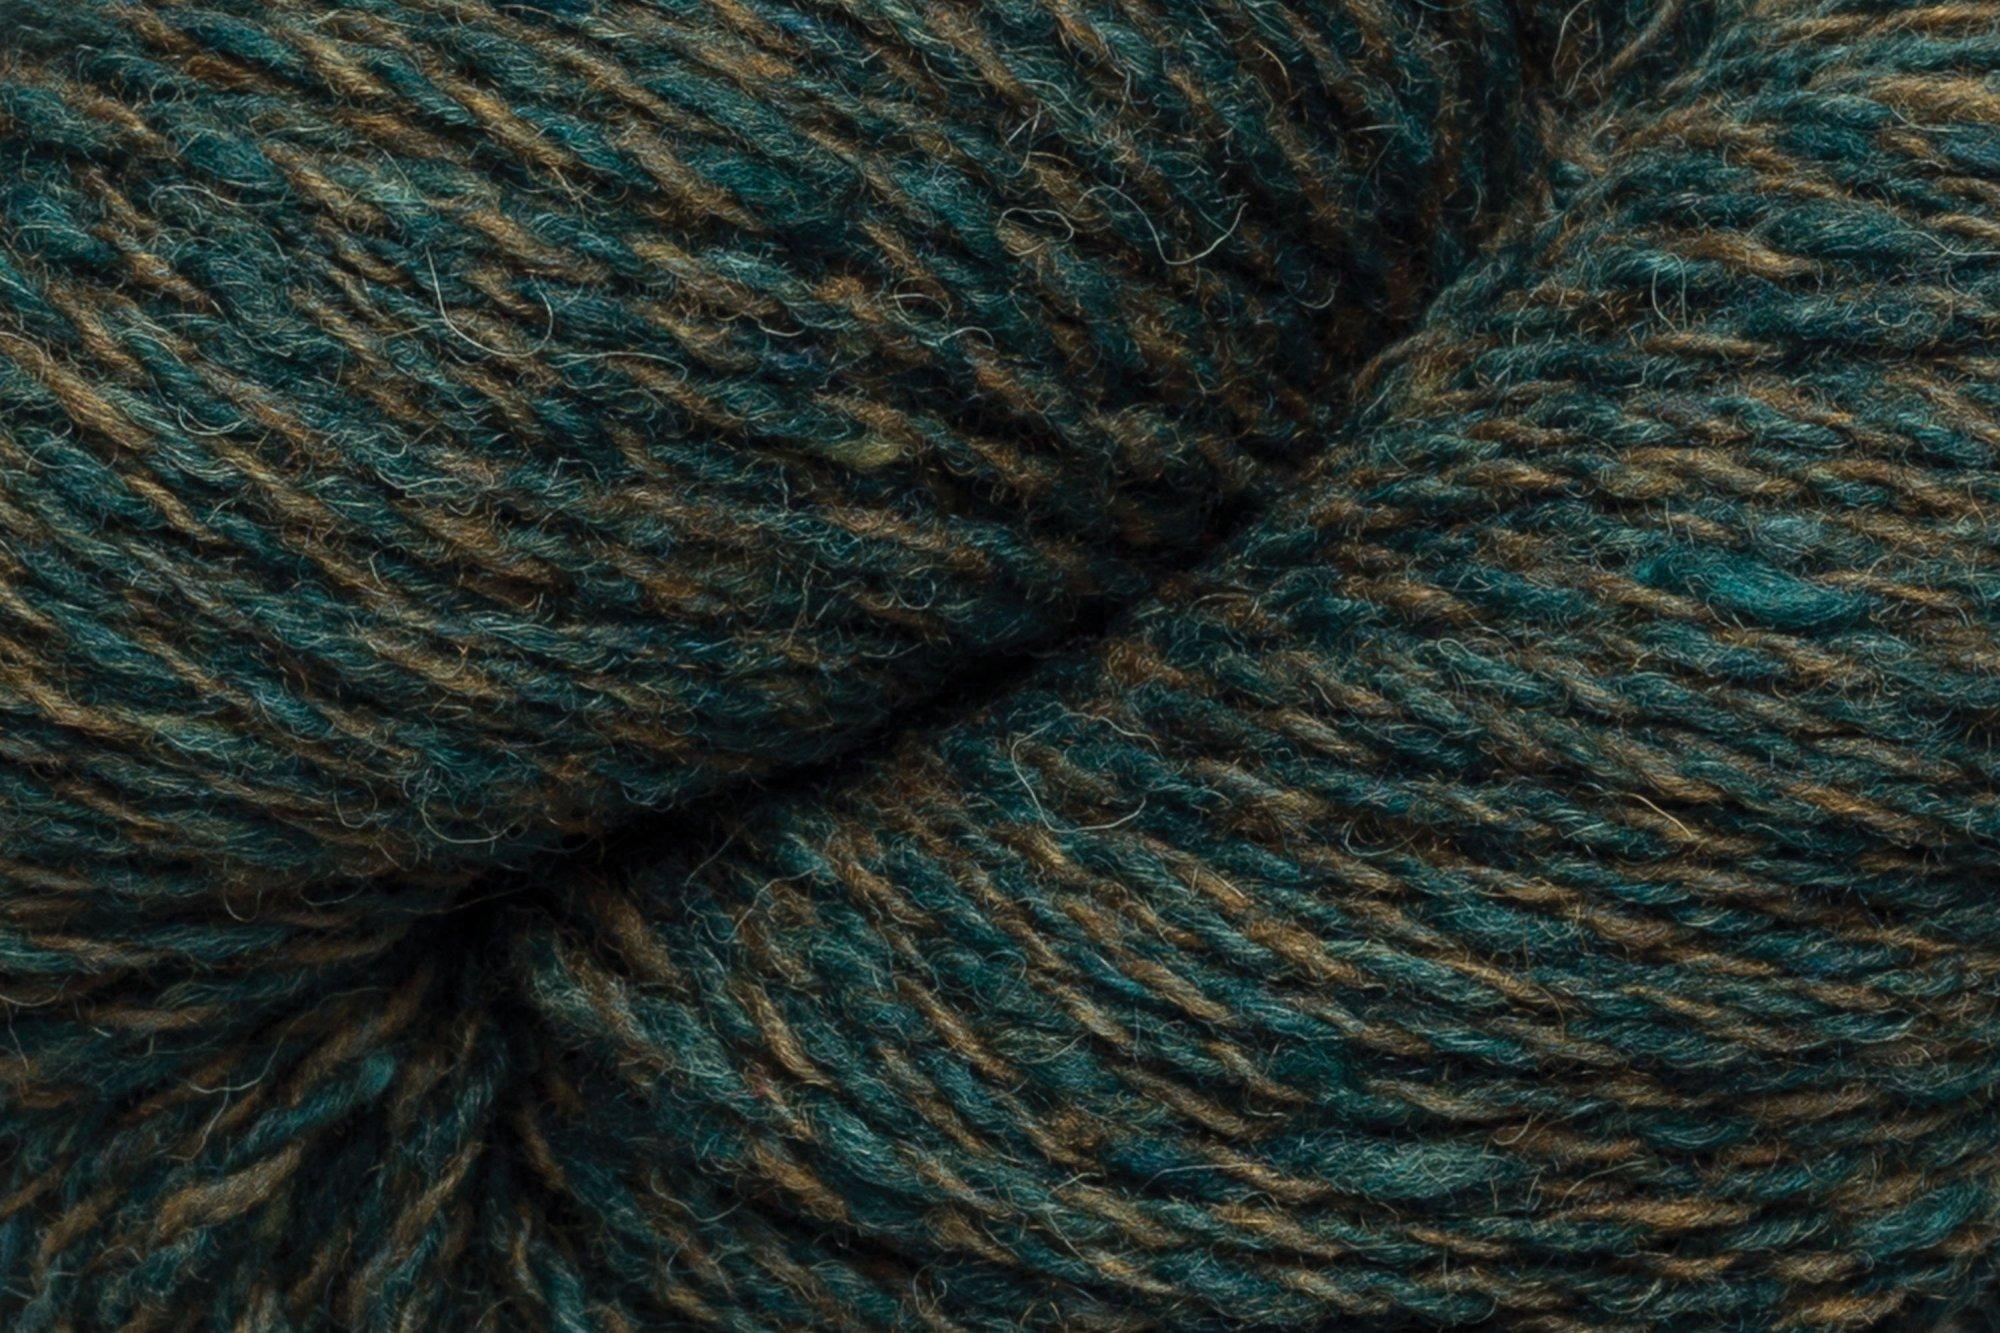 Valley Tweed 00114 - Lapwing